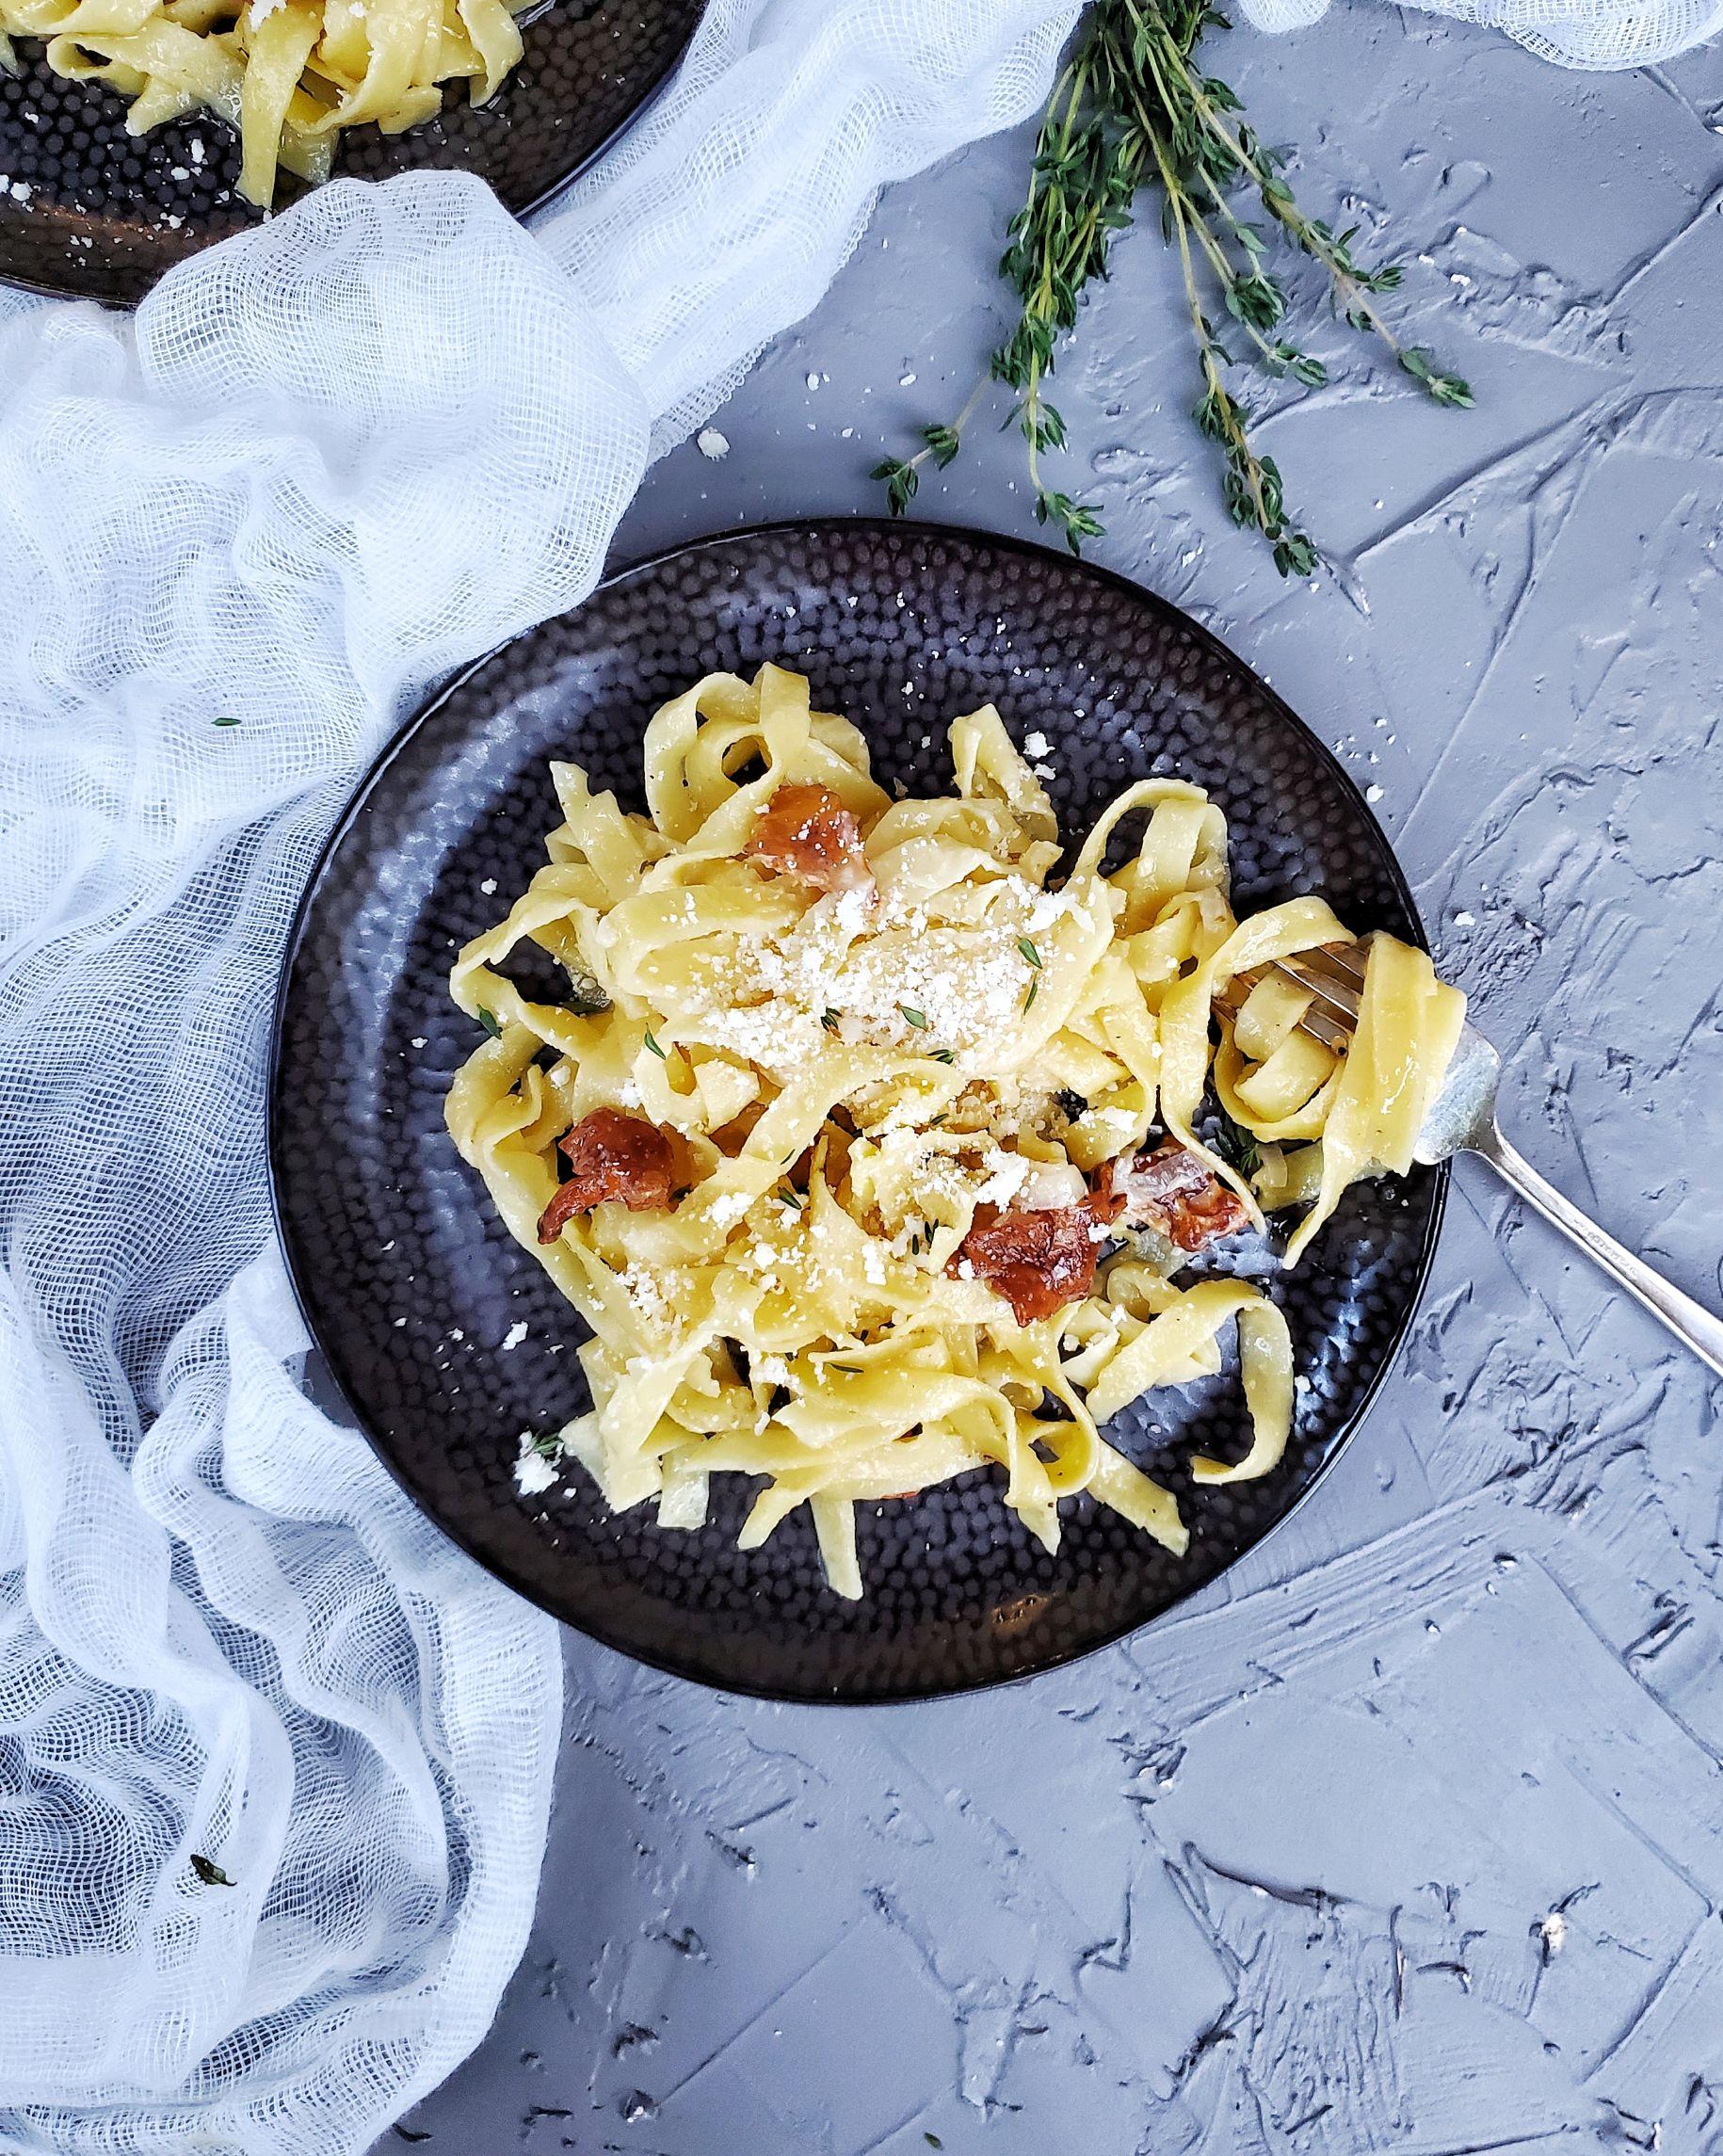 chanterelle mushroom pasta on plate